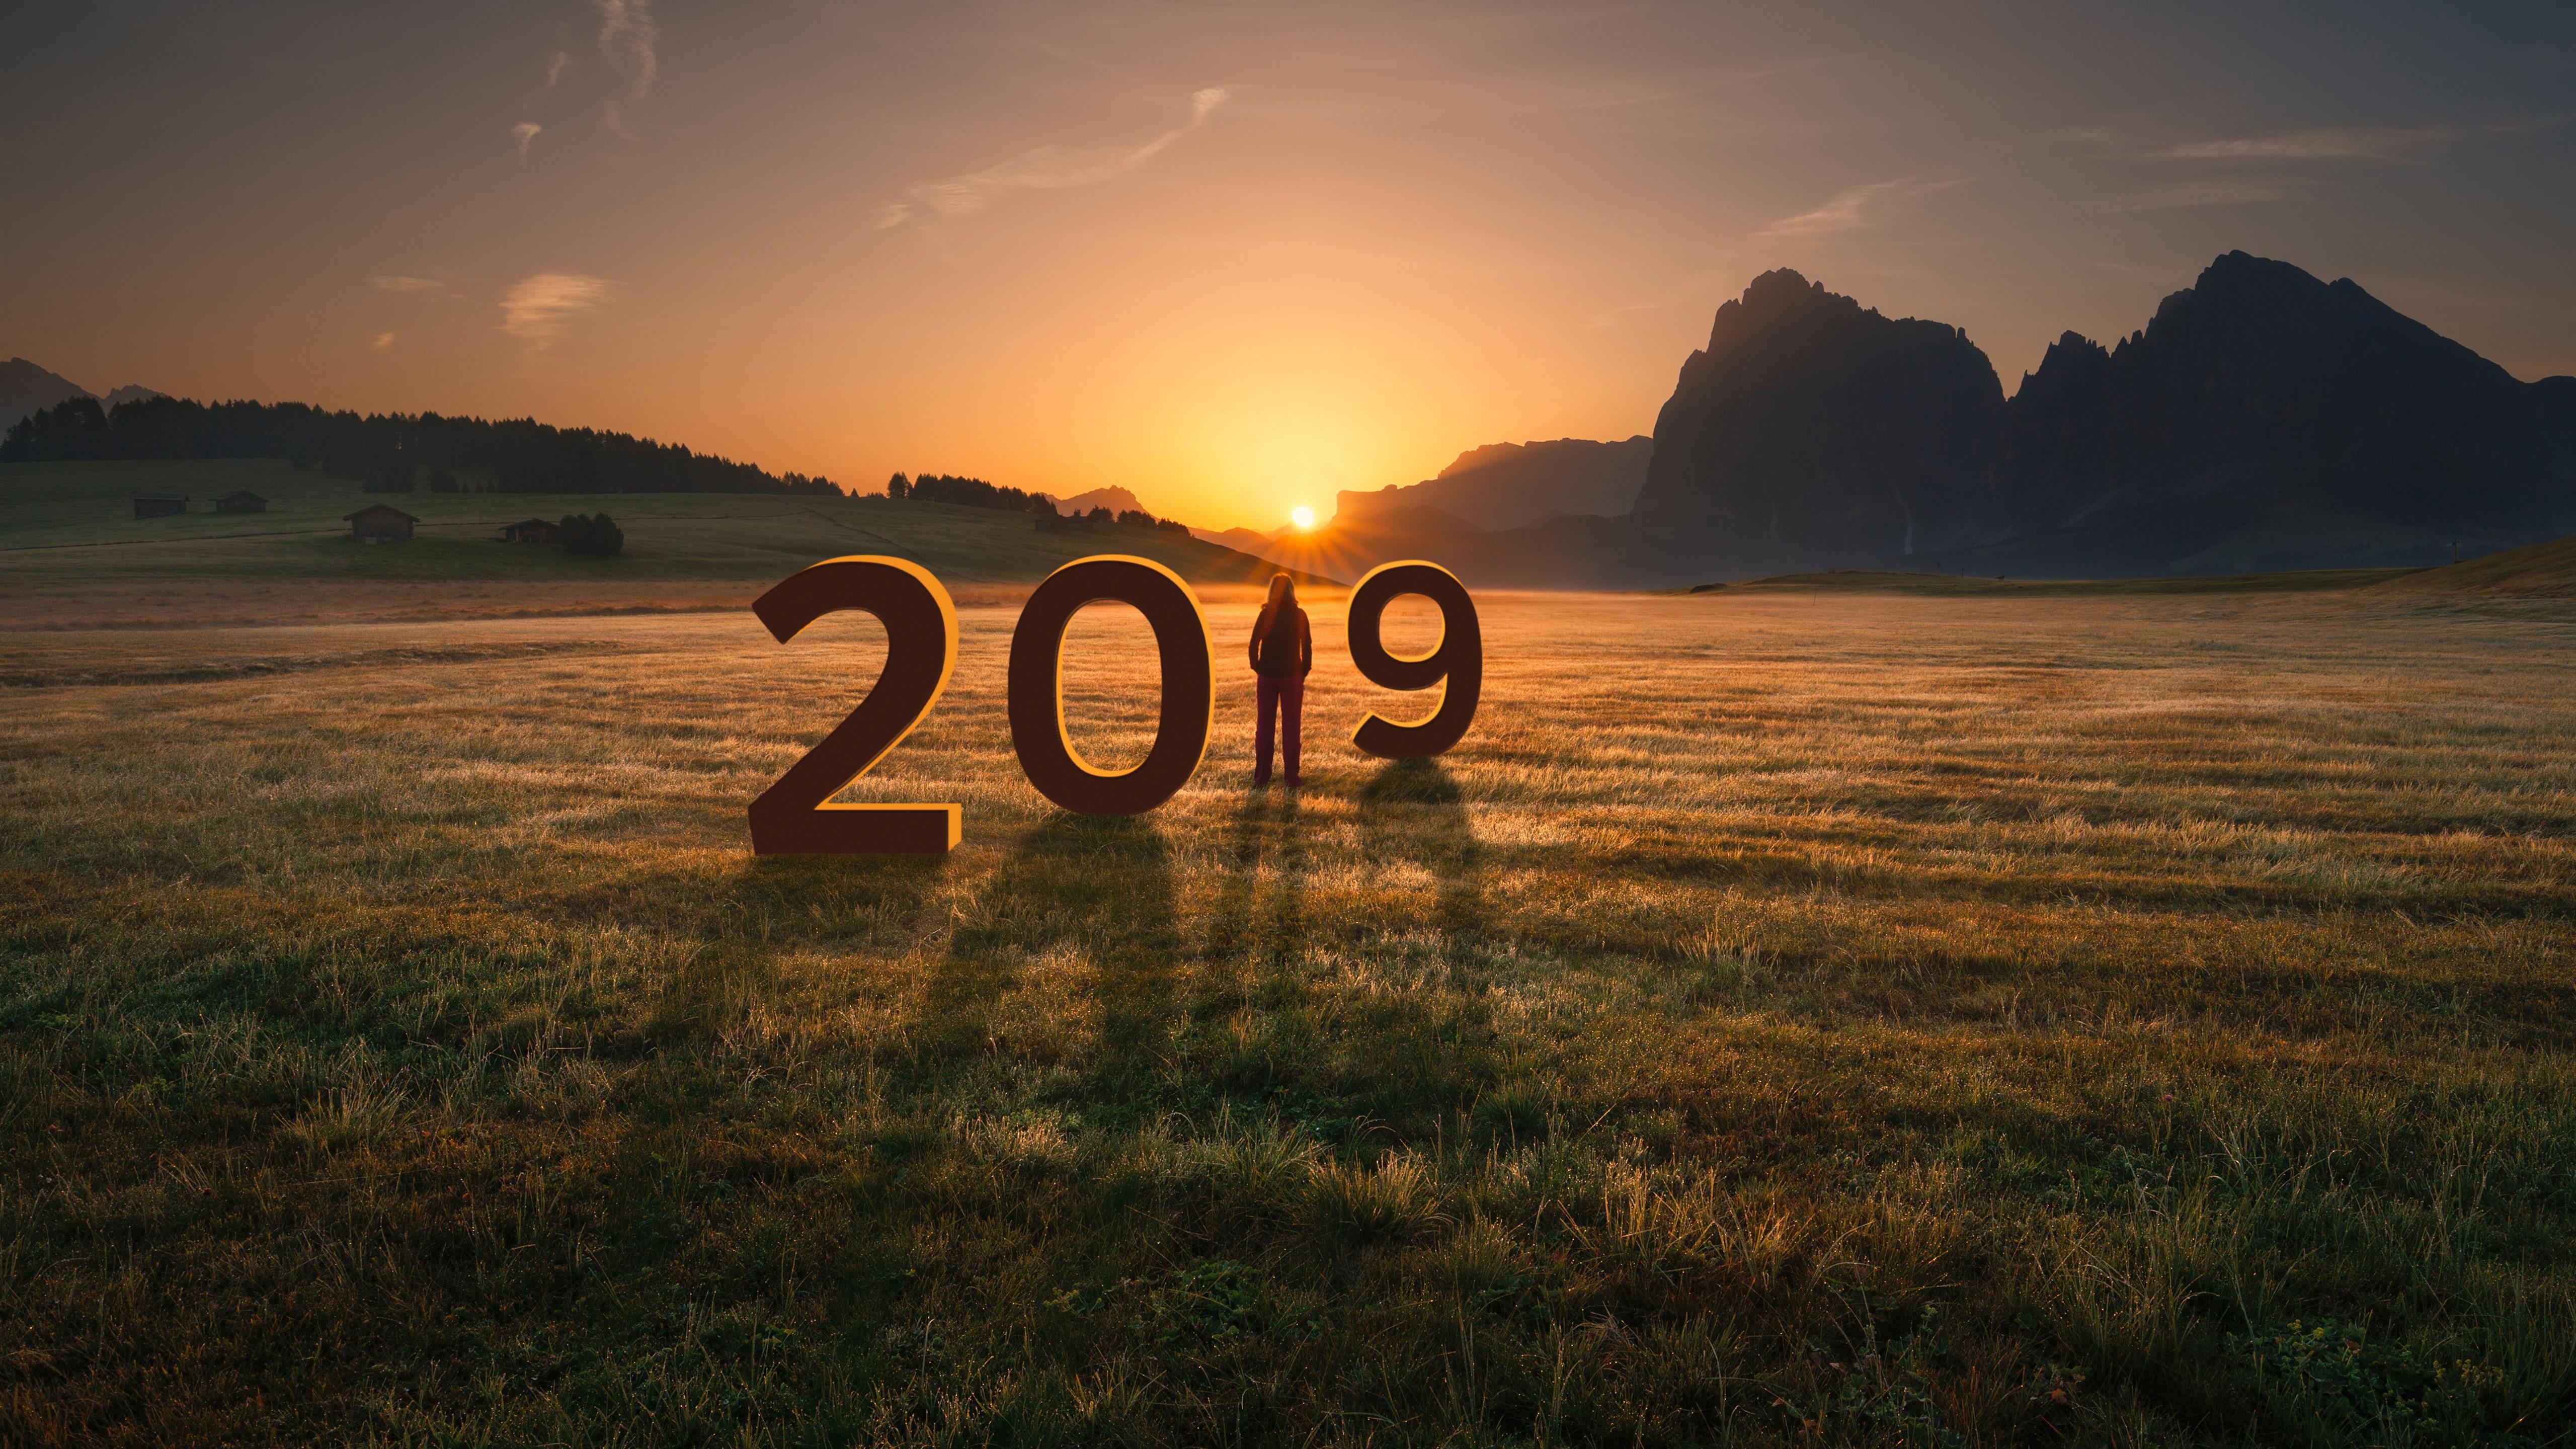 Best Of New Year 2019 Wallpapers Hd For: 배경 화면 새해 2019 년, 잔디, 여자, 산, 일몰 5120x2880 UHD 5K 그림, 이미지